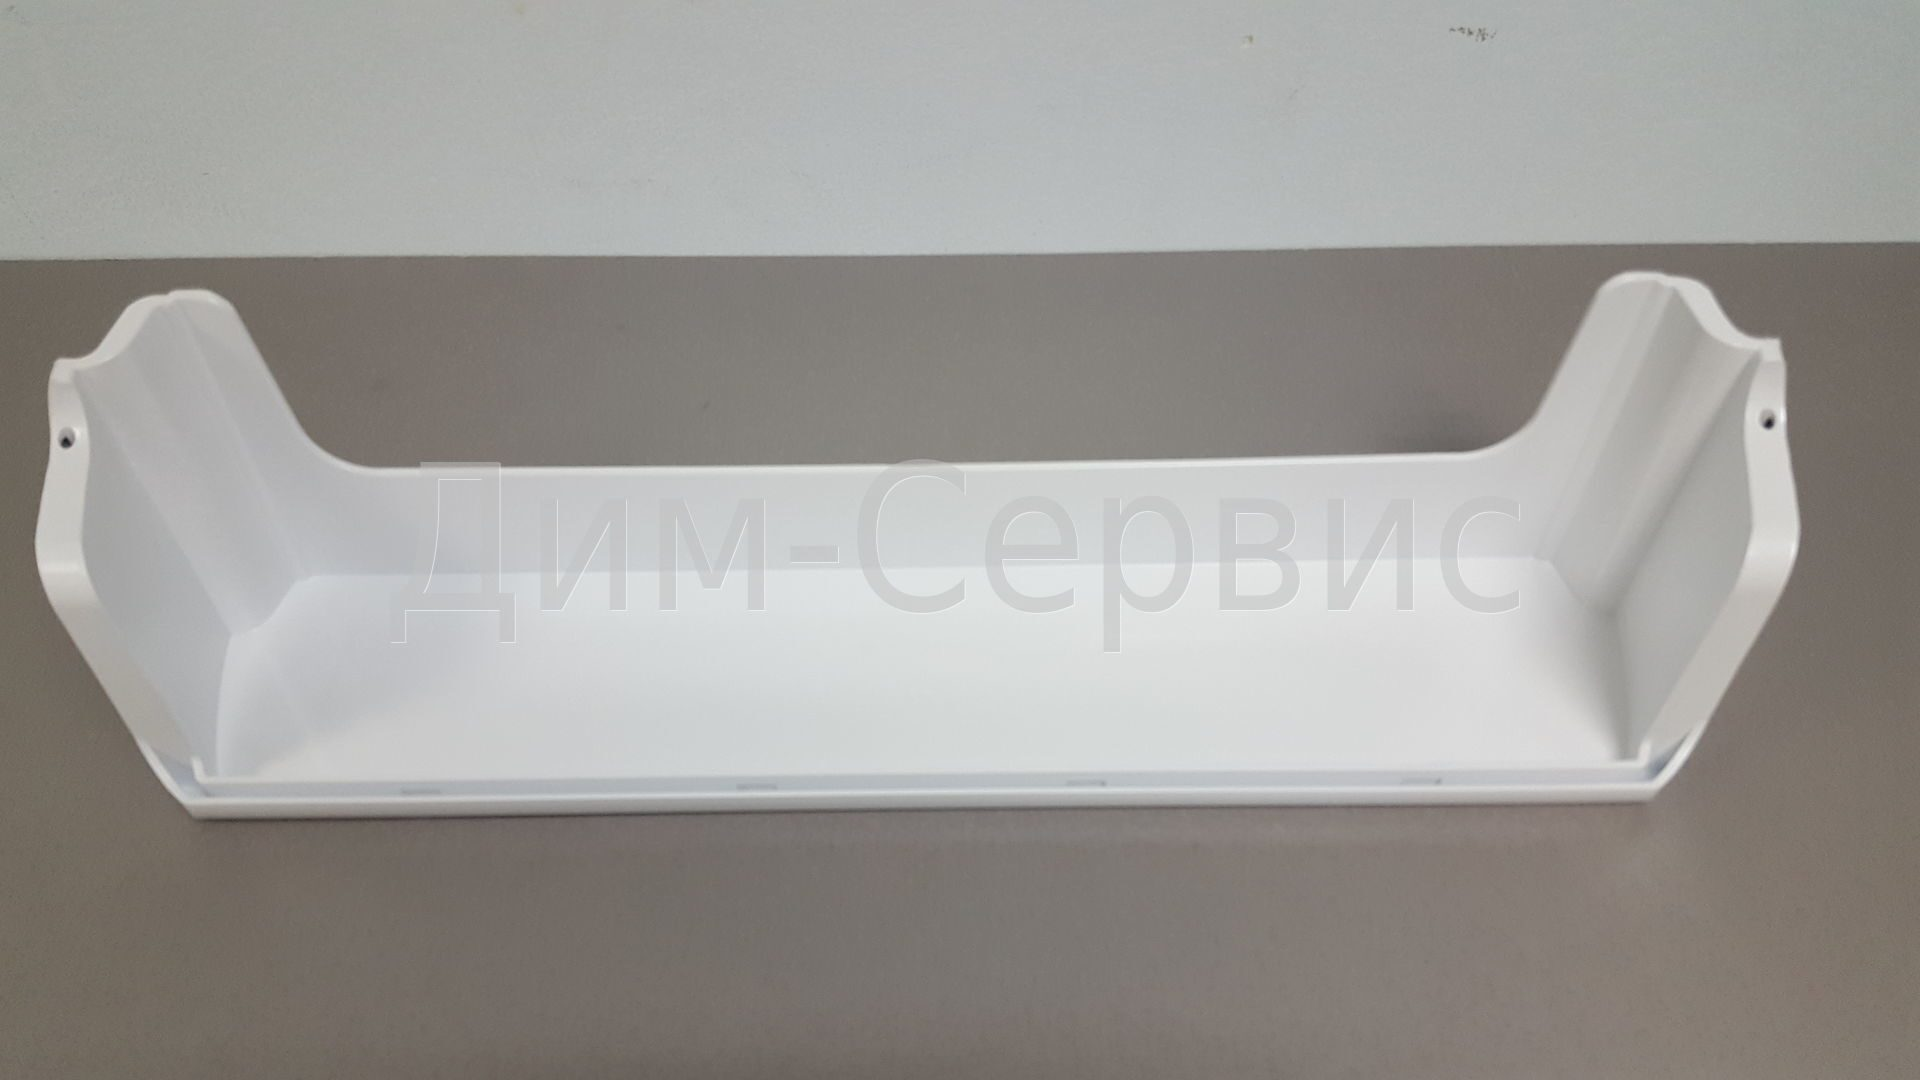 Балкон двери холодильника атлант (769748401100) цена: 550 ру.